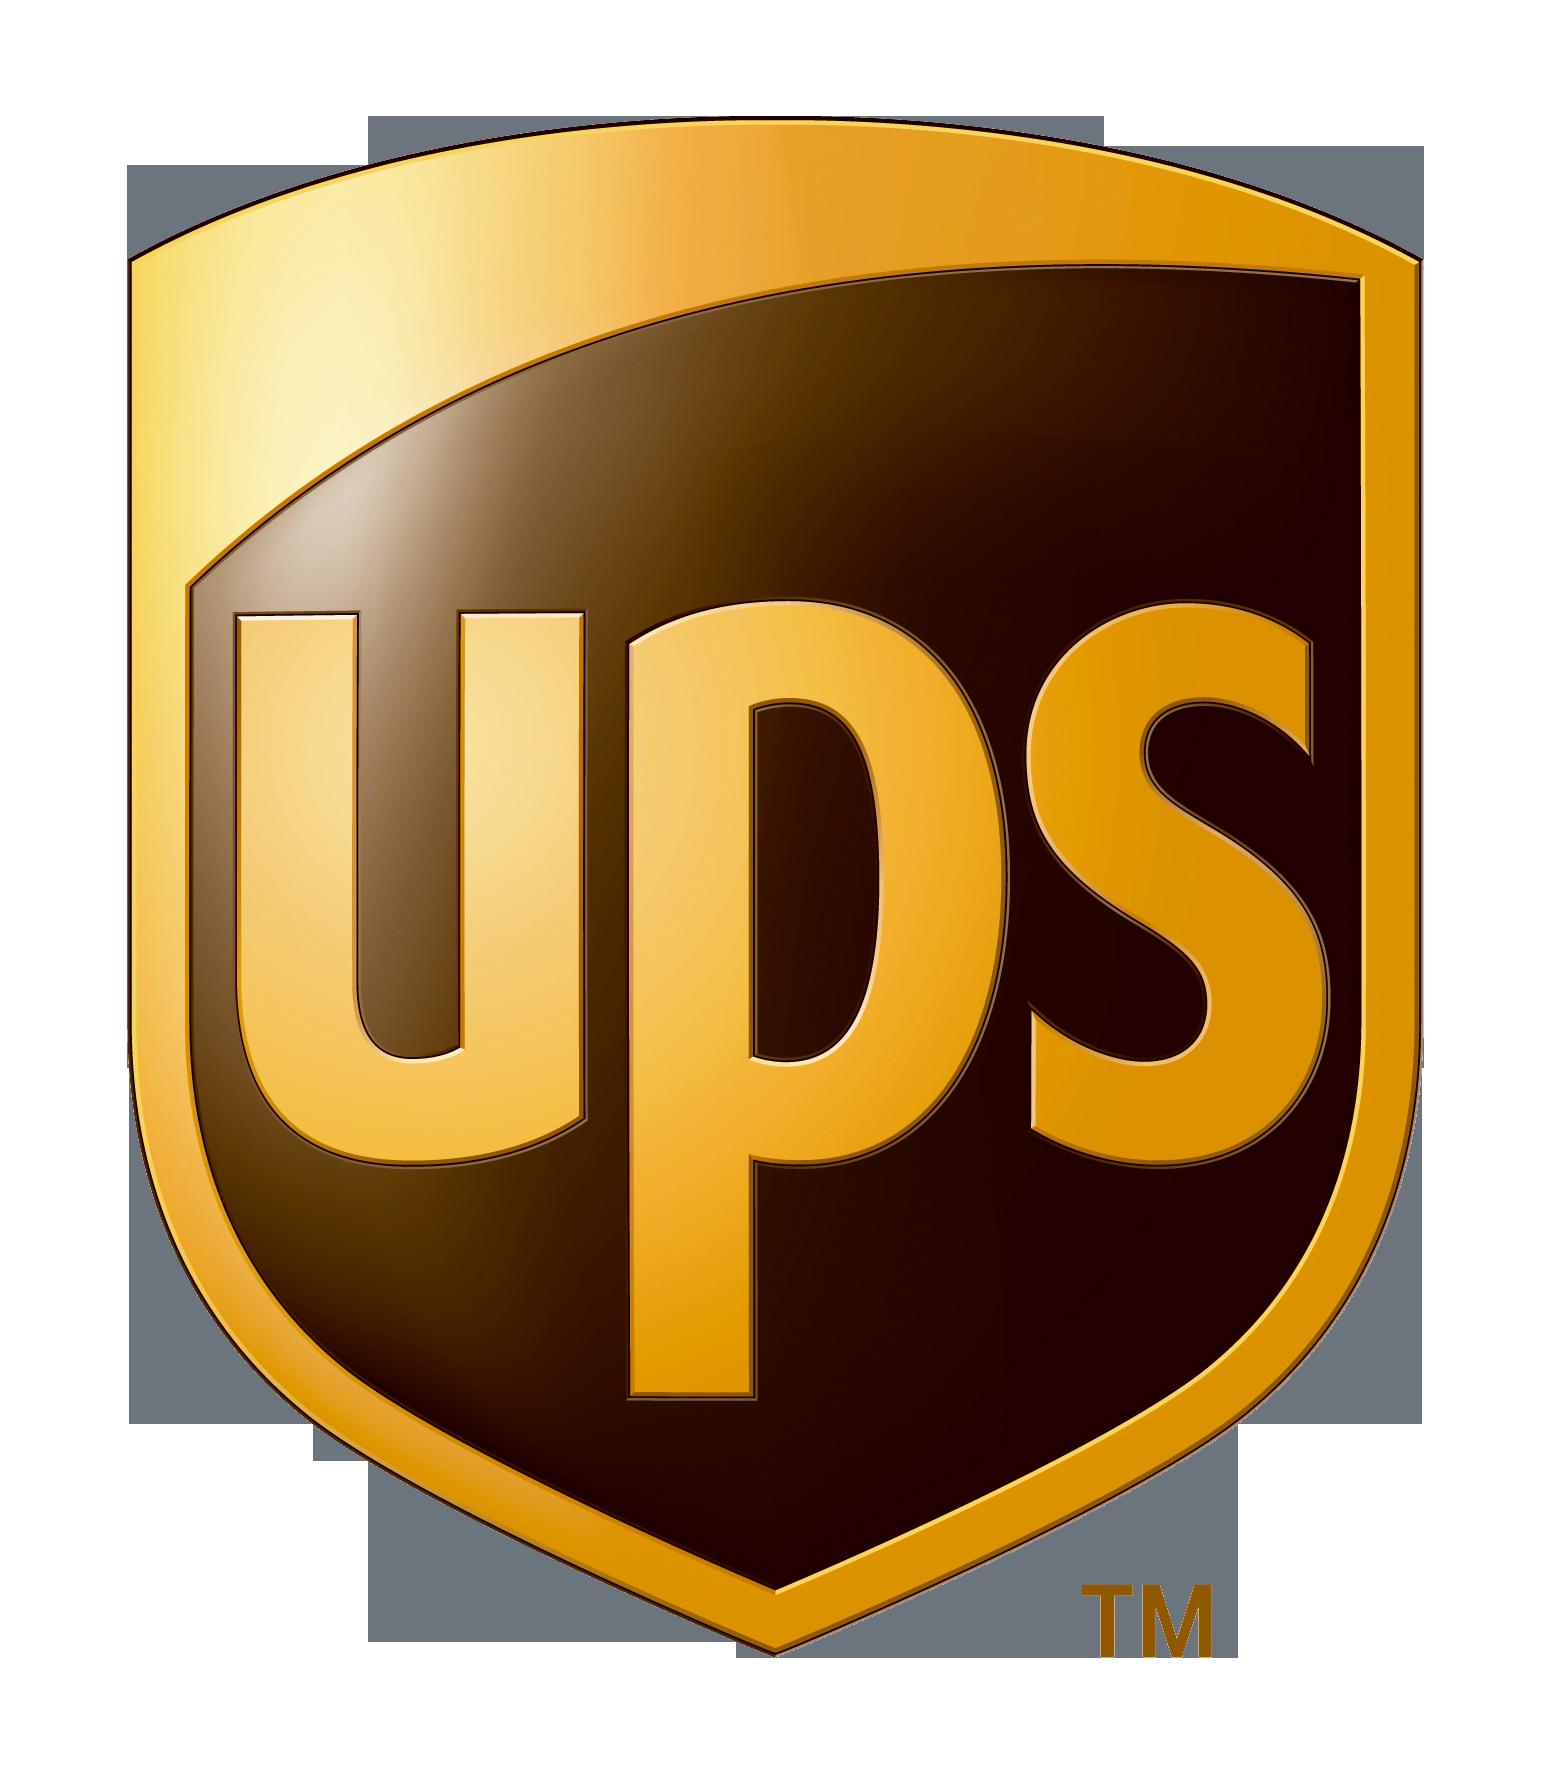 Logo Ups PNG-PlusPNG.com-1552 - Logo Ups PNG